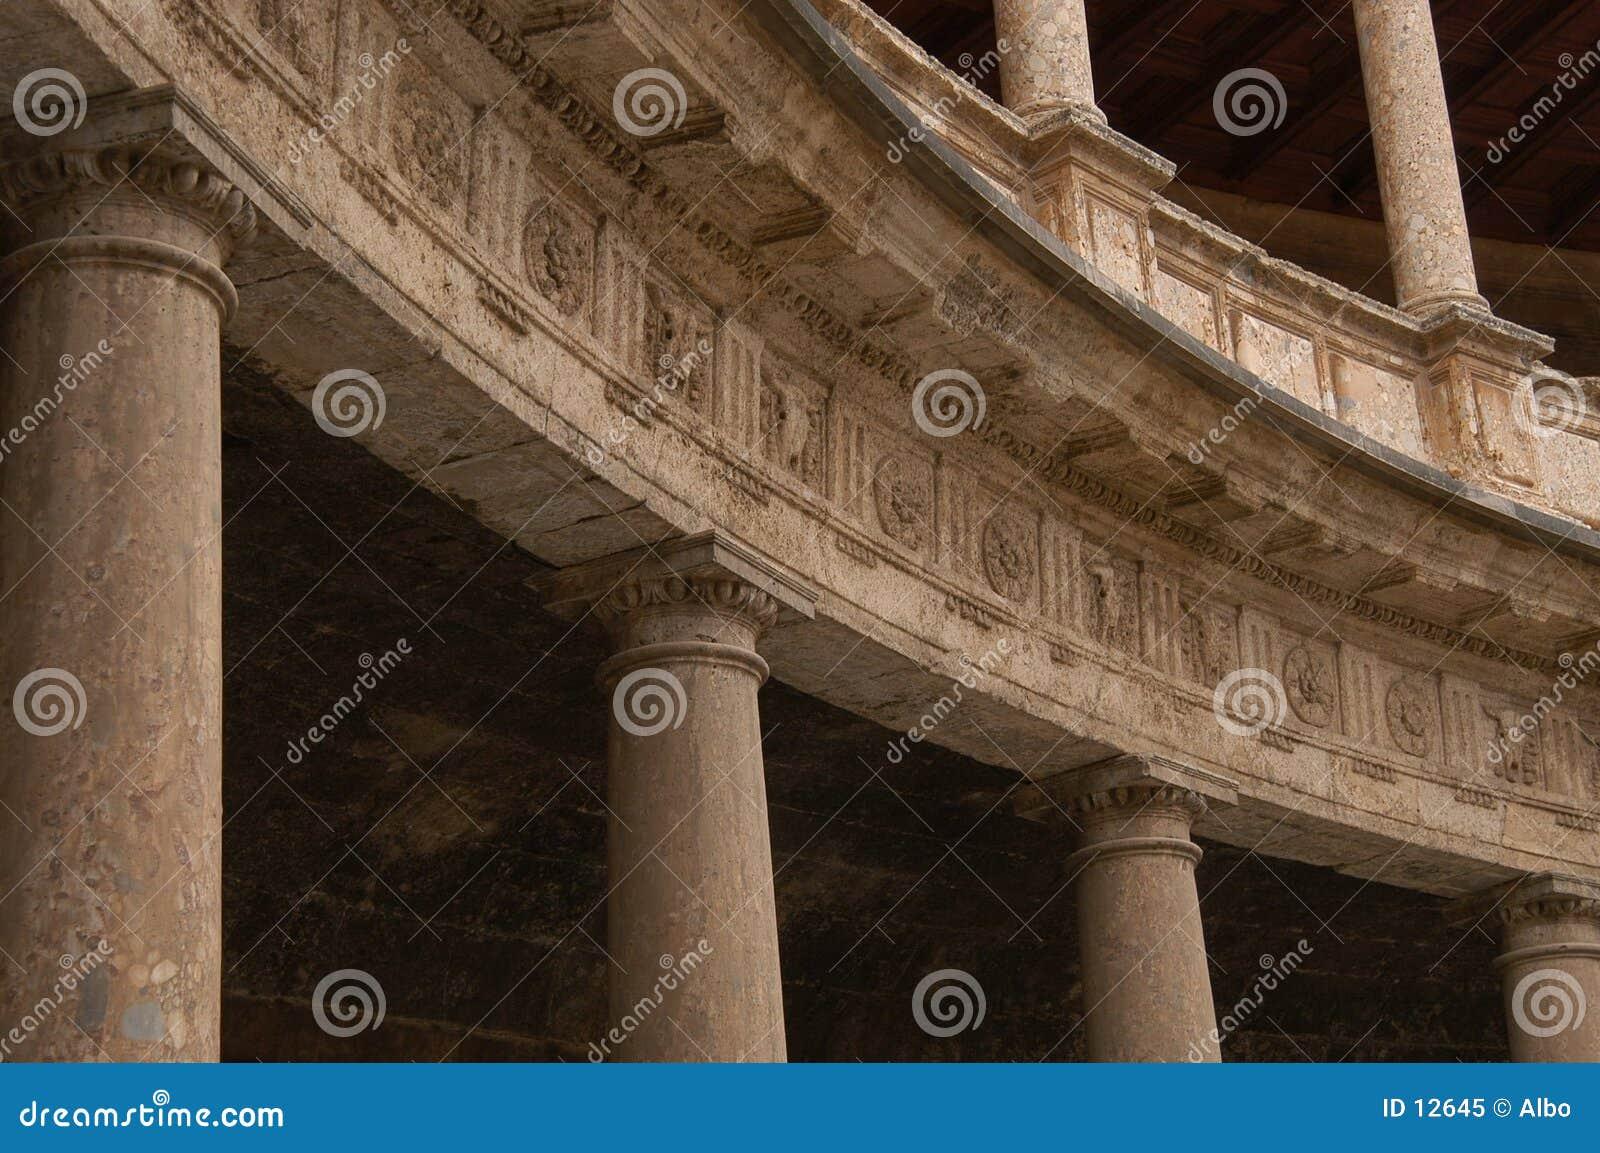 Palacio v alhambra carlos